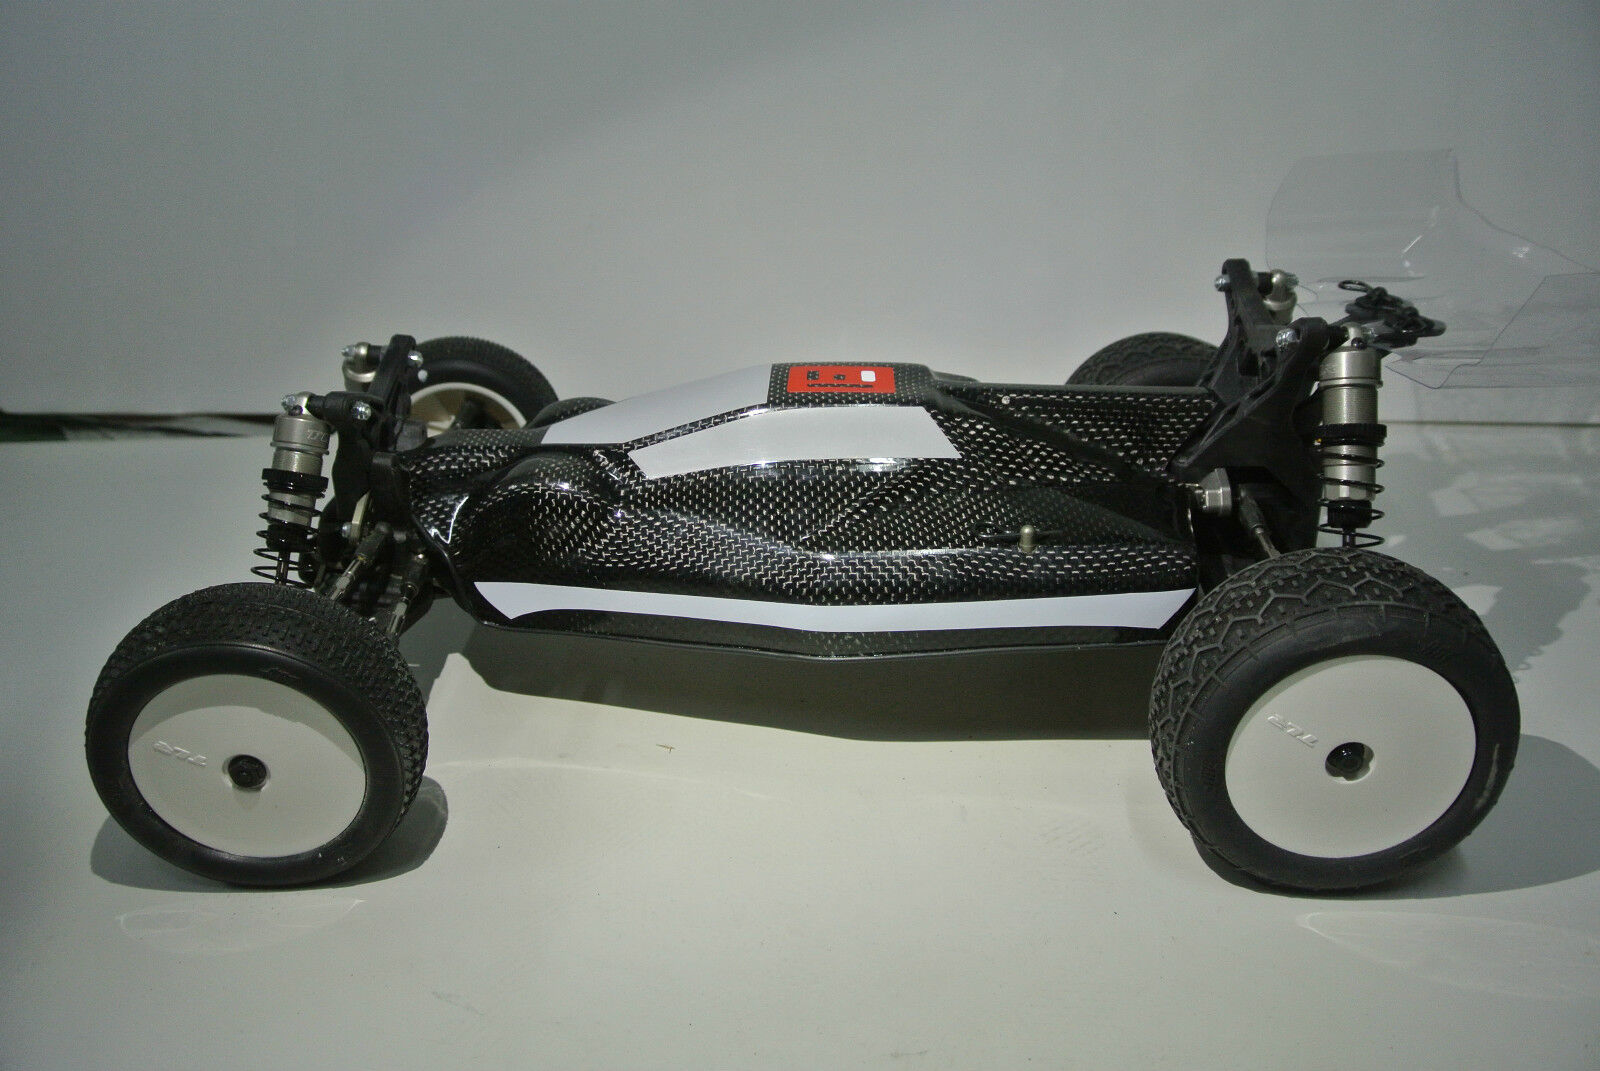 LOSI squadra LOSI RACING TLR TLR TLR  22-4 REAL autoBON FIBER corpo BY FINAL EVOLUTION 1 10 1ea3cd